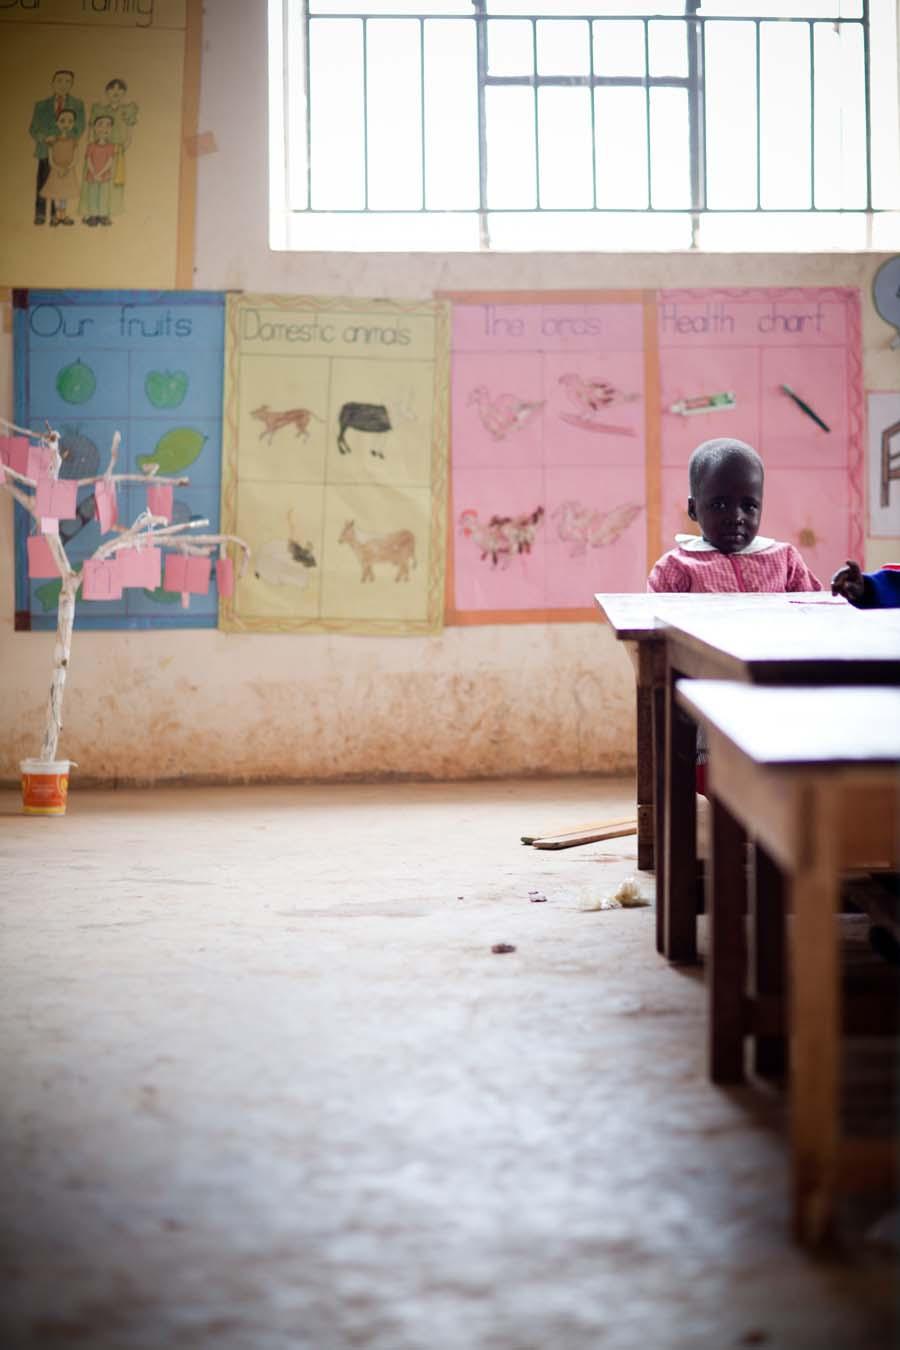 jessicadavisphotography.com | Jessica Davis Photography | Portrait Work in Uganda| Travel Photographer | World Event Photographs 8 (5).jpg